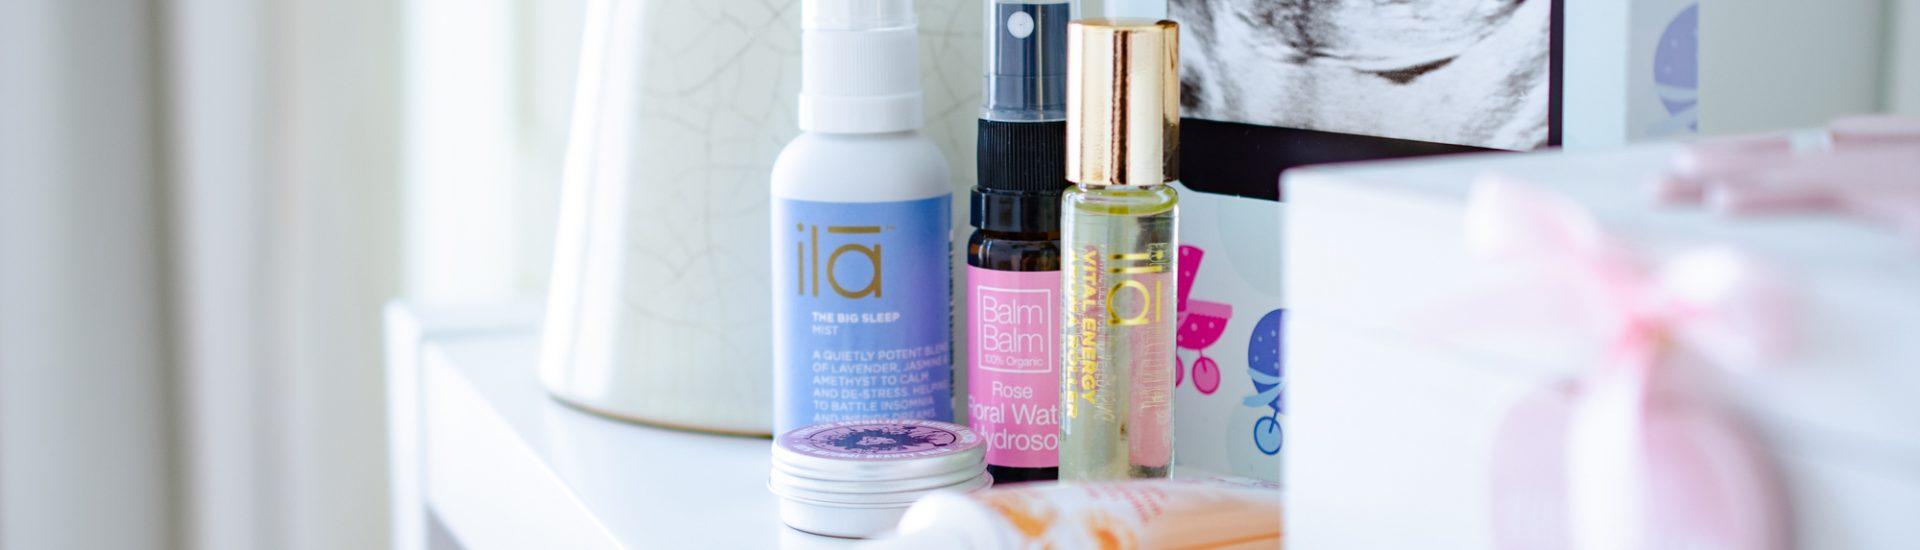 Pregnancy hospital bag essentials from LoveLula